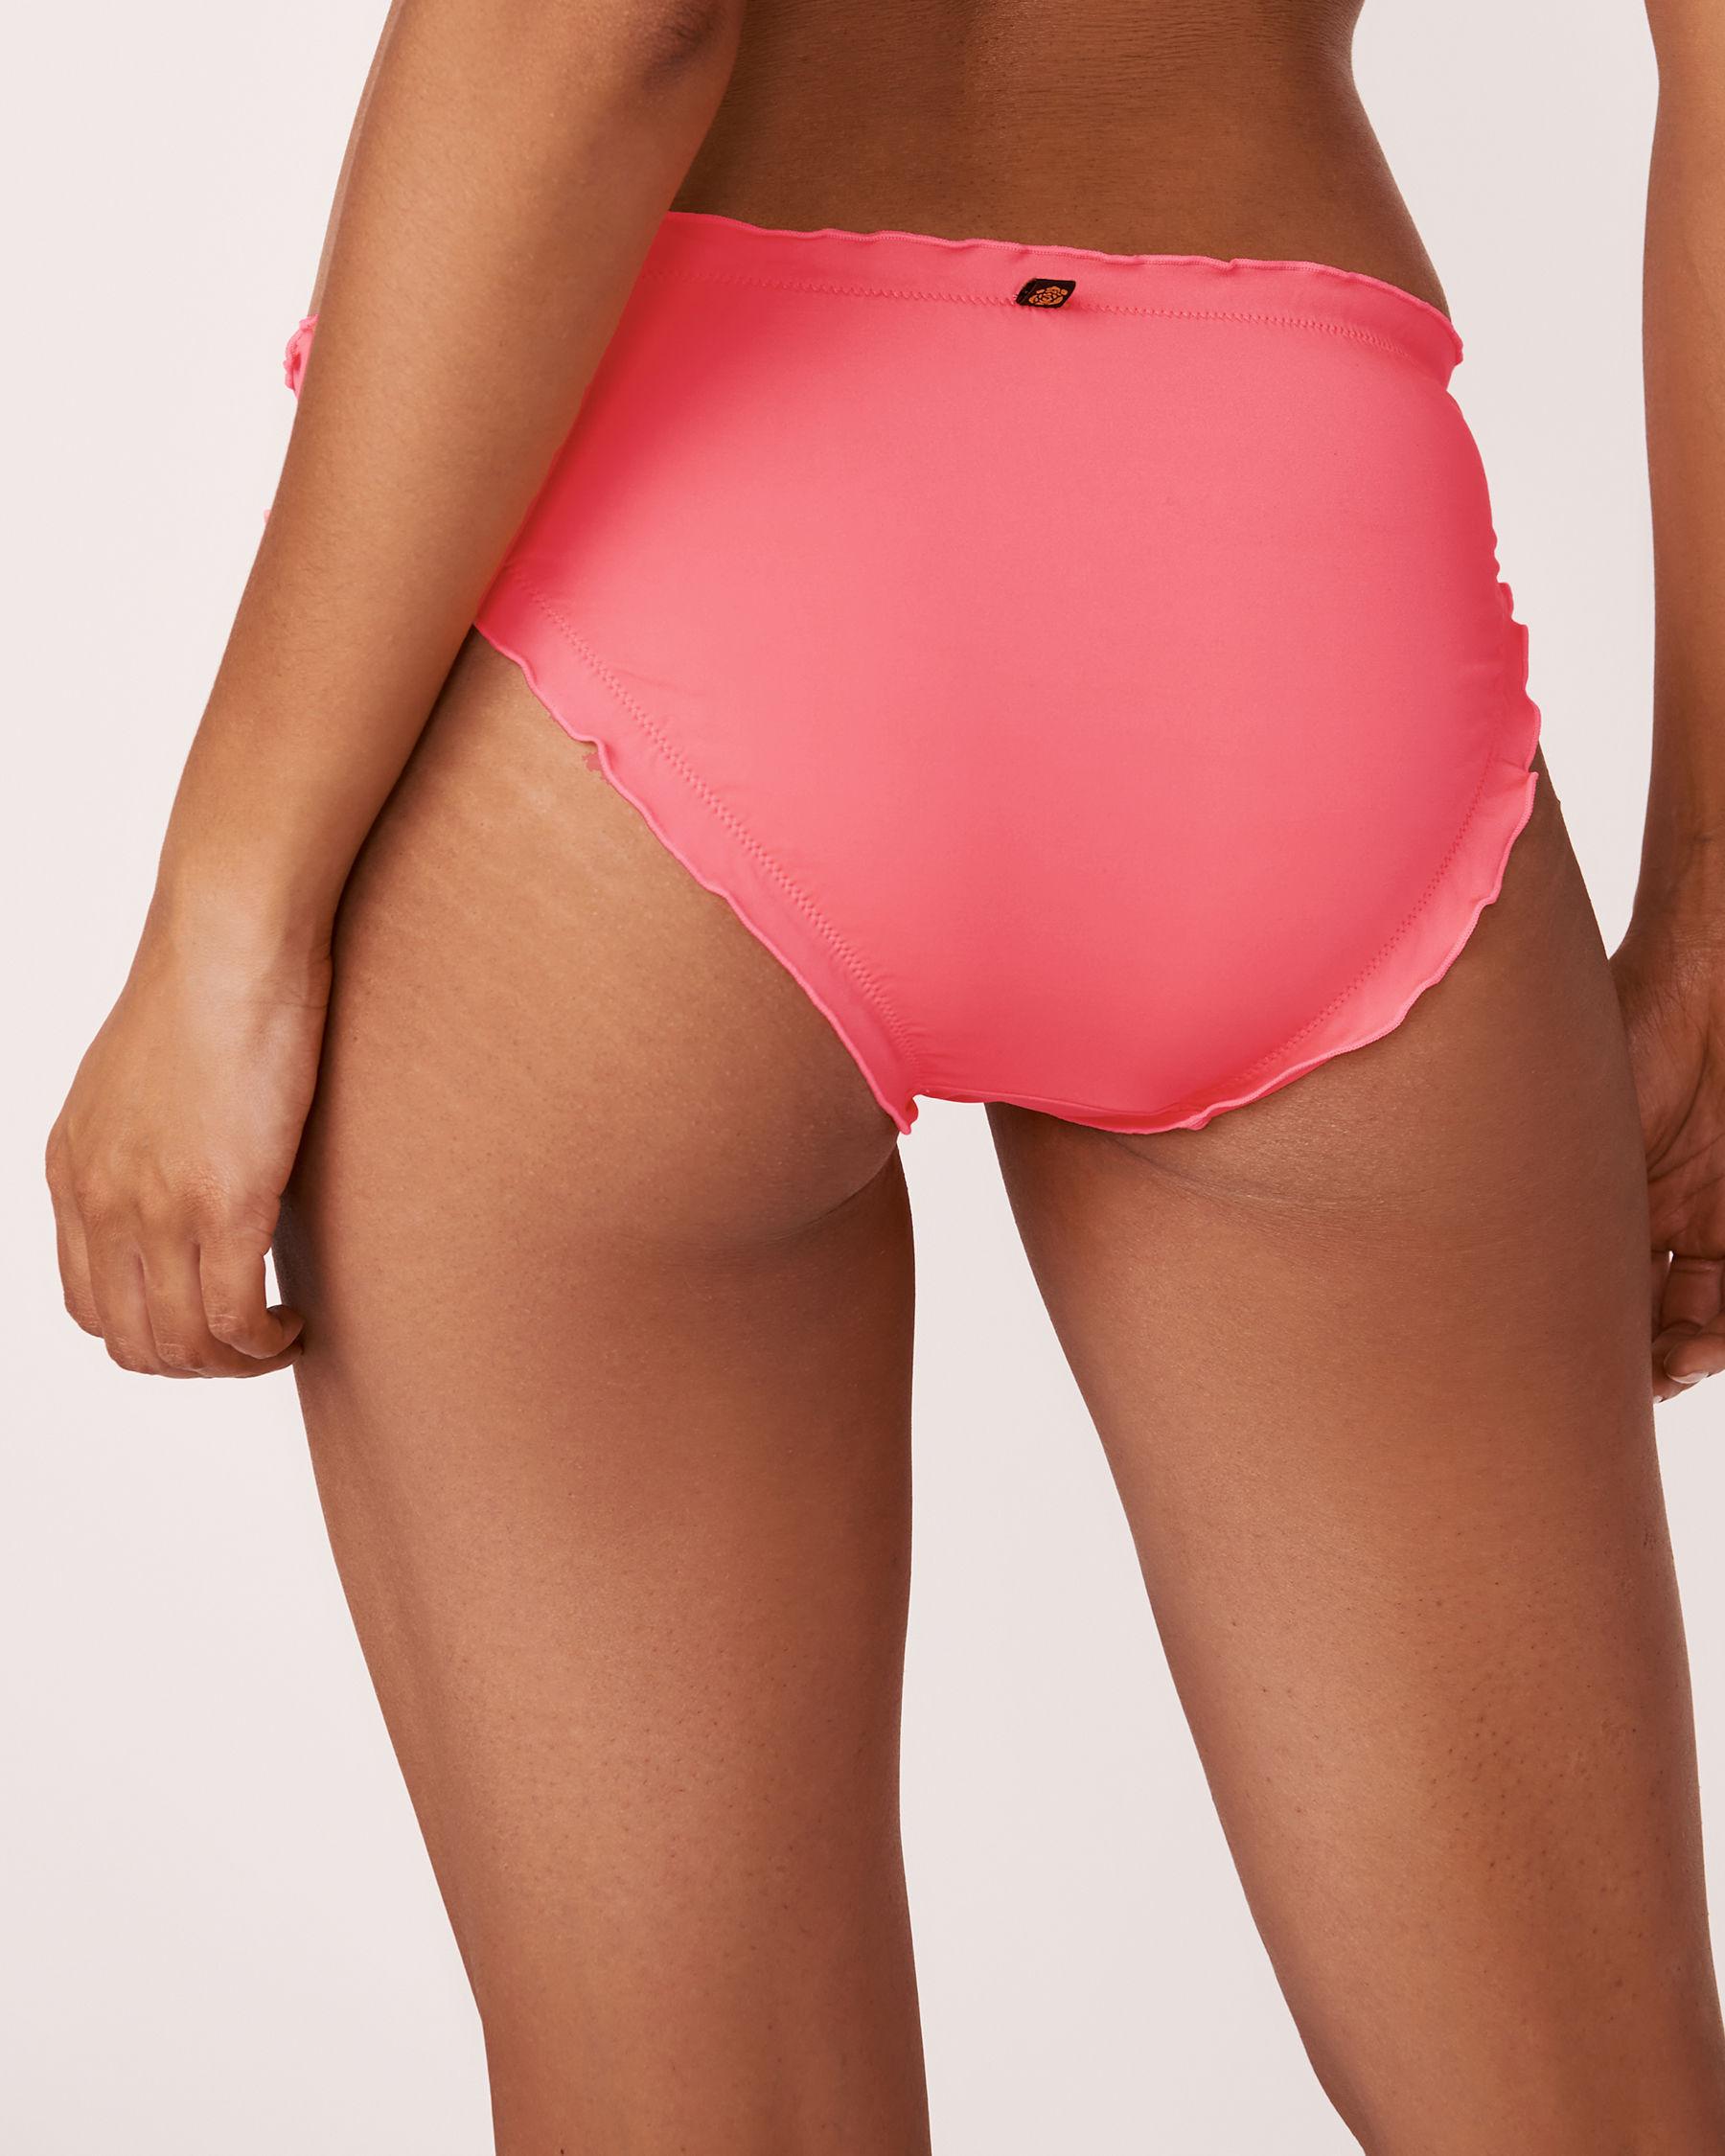 LA VIE EN ROSE AQUA MELON Ruffle Bikini Bottom Pink 70300035 - View4